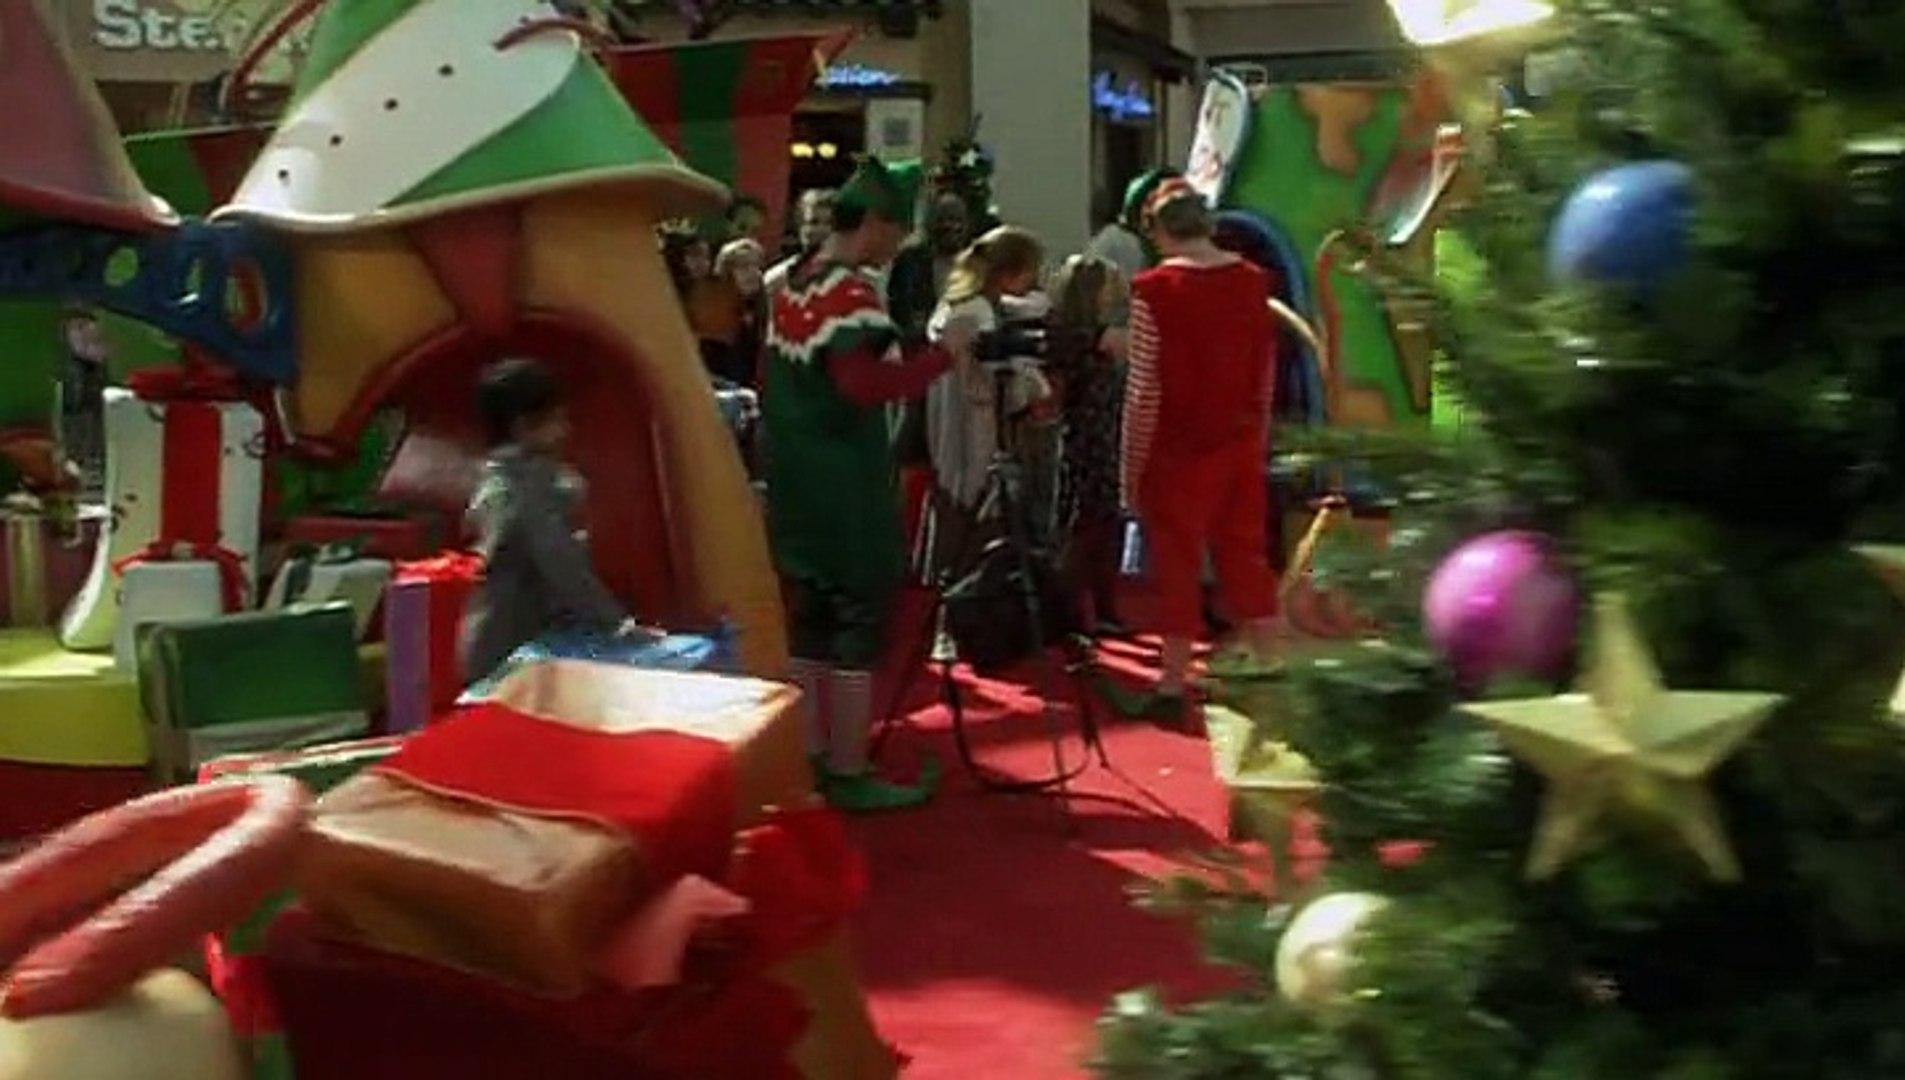 The Christmas Clause.The Christmas Clause 2008 Hallmark Movies Full Hd P1